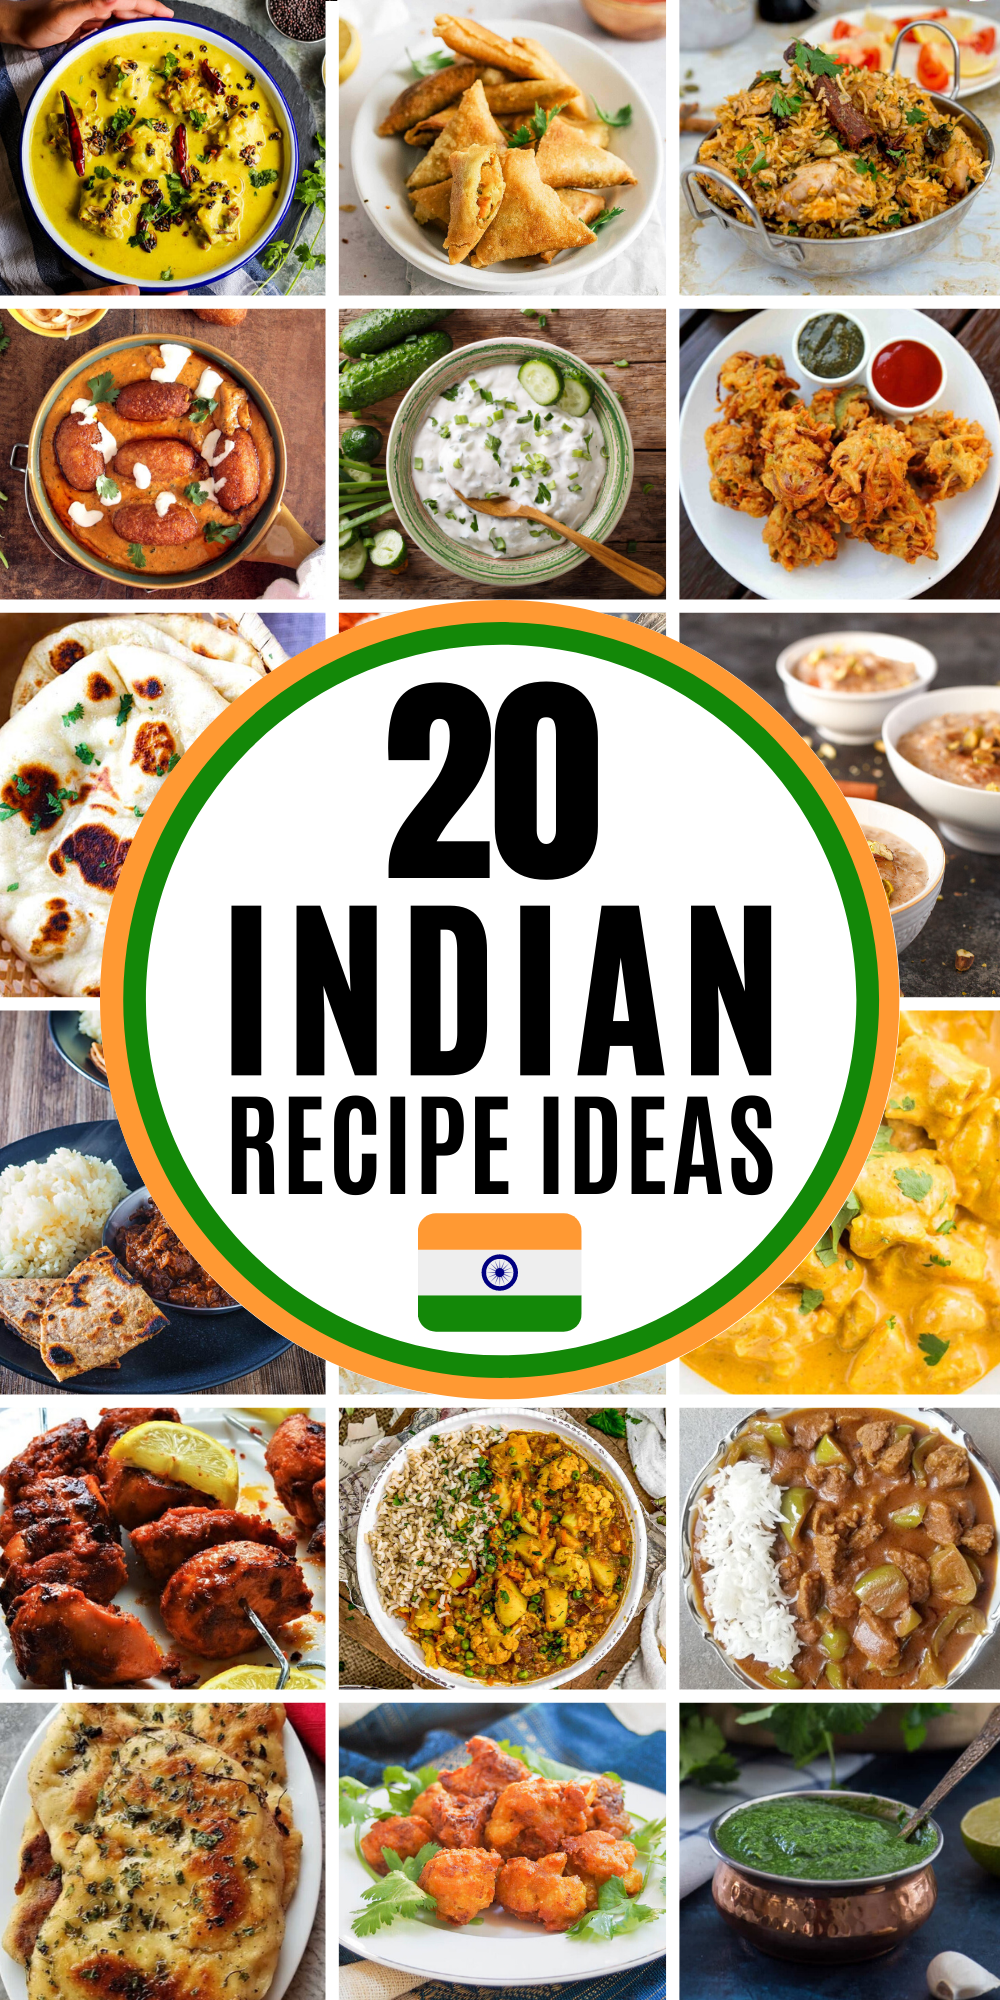 Asian Food Recipes Chinese Food Recipes Comfort Food Recipes Fall Food Recipes Food Recipes Appetizers In 2020 Indian Food Recipes Recipes International Recipes